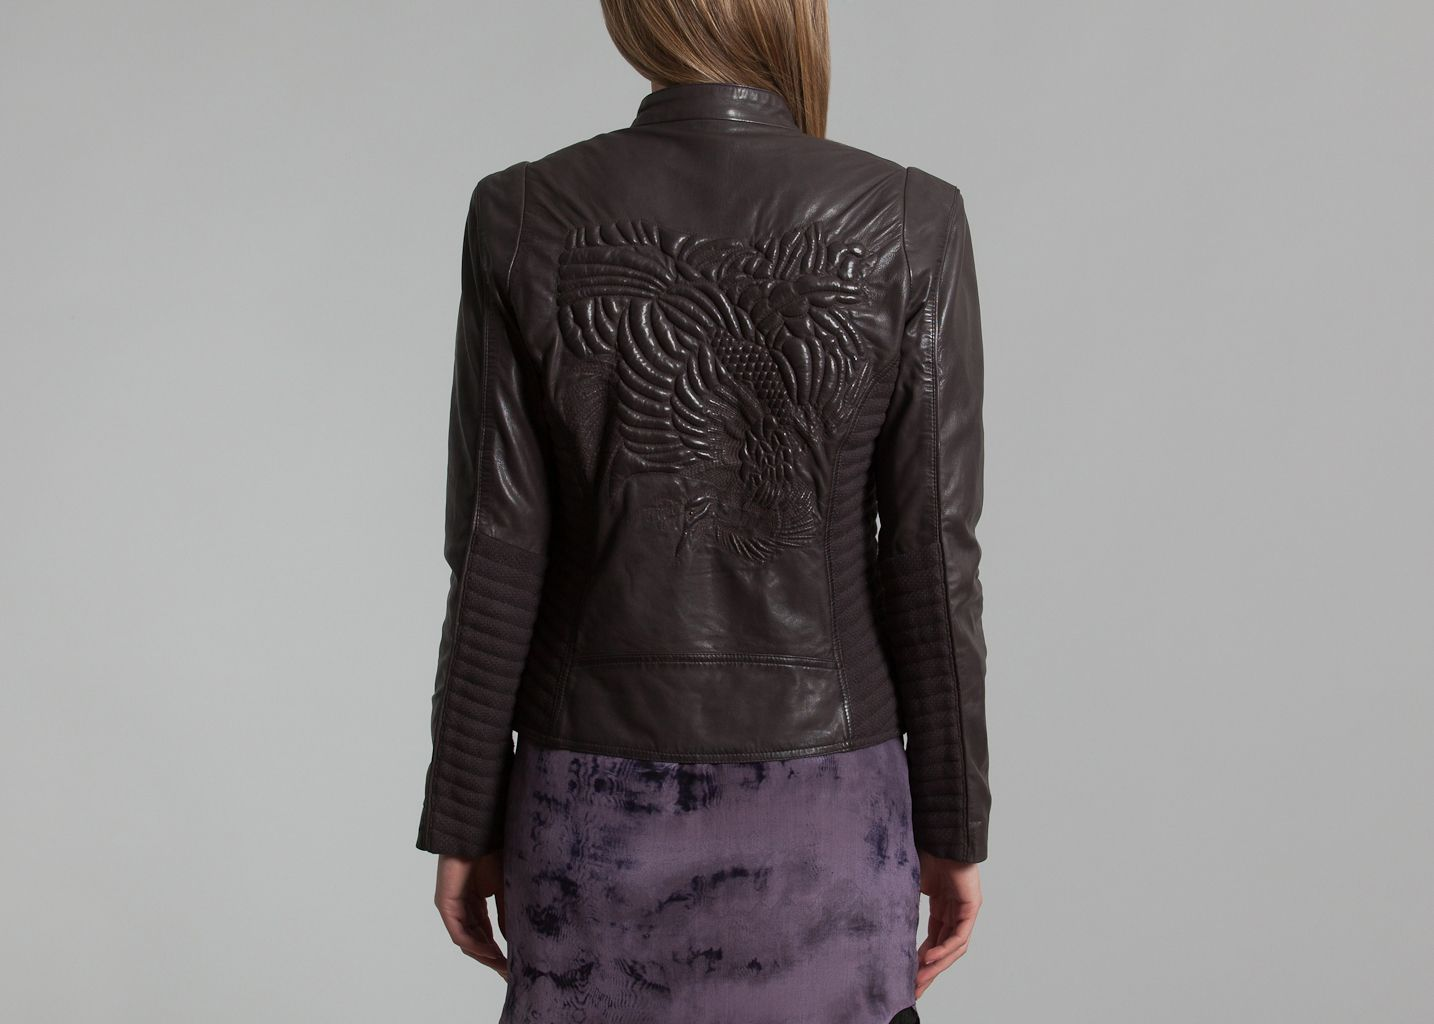 Black Pearl Jacket - Stéphanie Vaillé